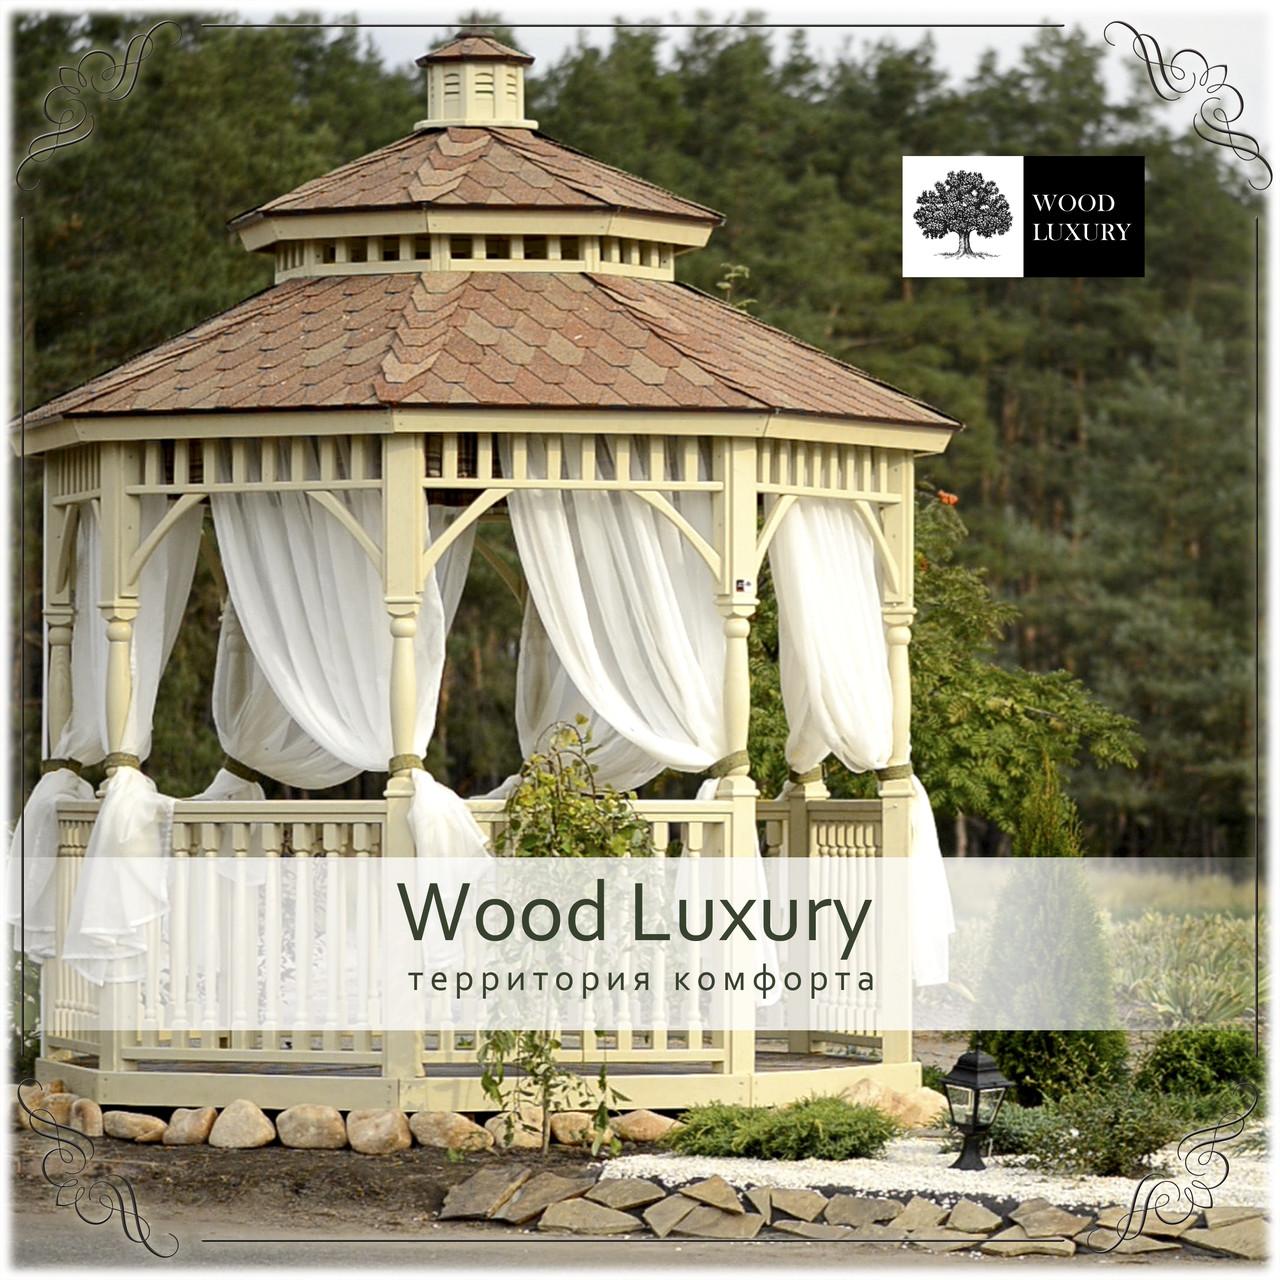 Беседки от производителя. Wanessa. - Wood Luxury в Киеве